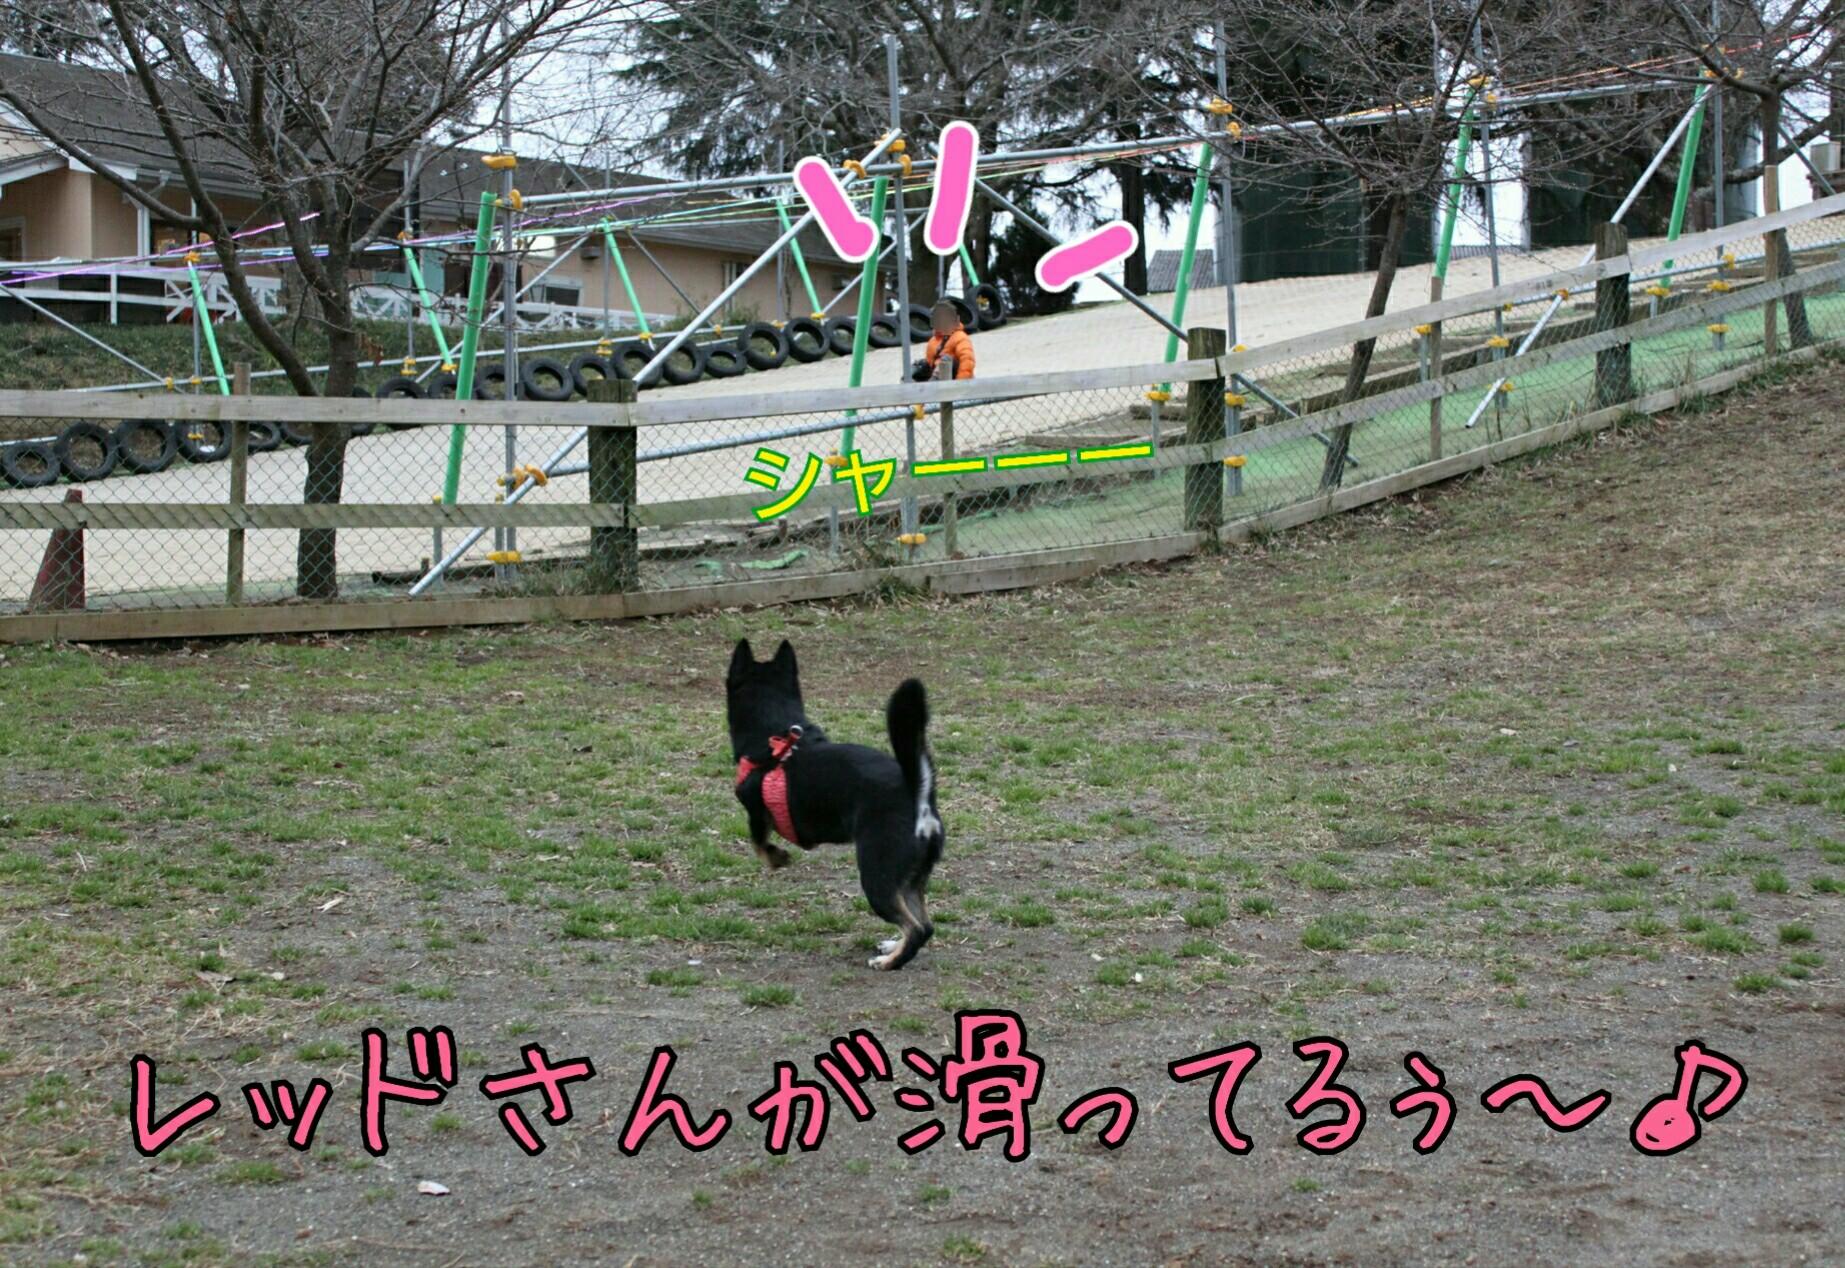 20170312095932fc3.jpg